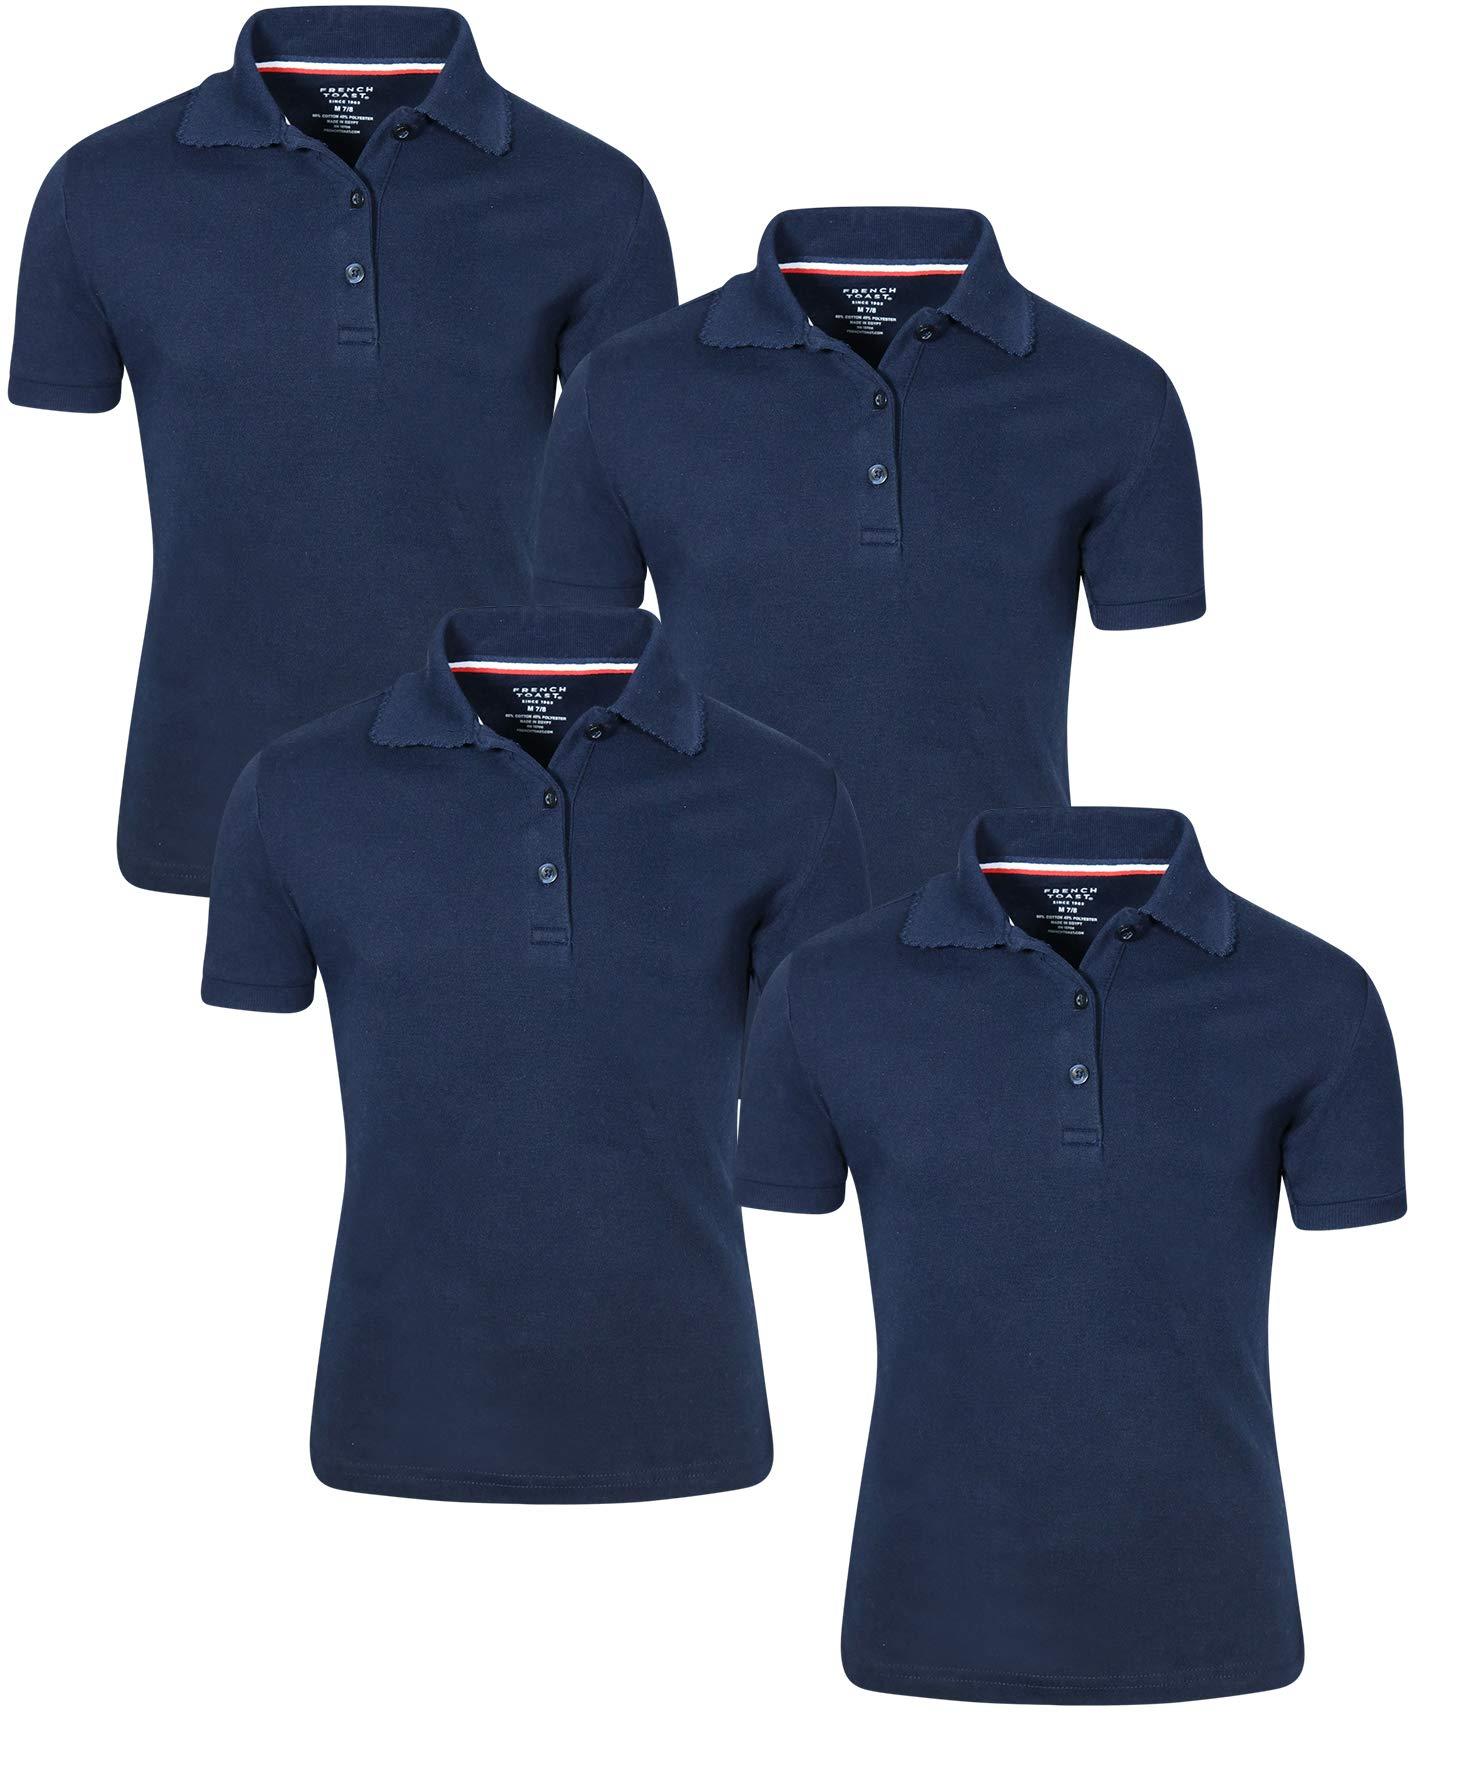 French Toast Girl's Uniform Polo Short Sleeve Interlock (4 Pack) (Large - 10/12, Navy)'